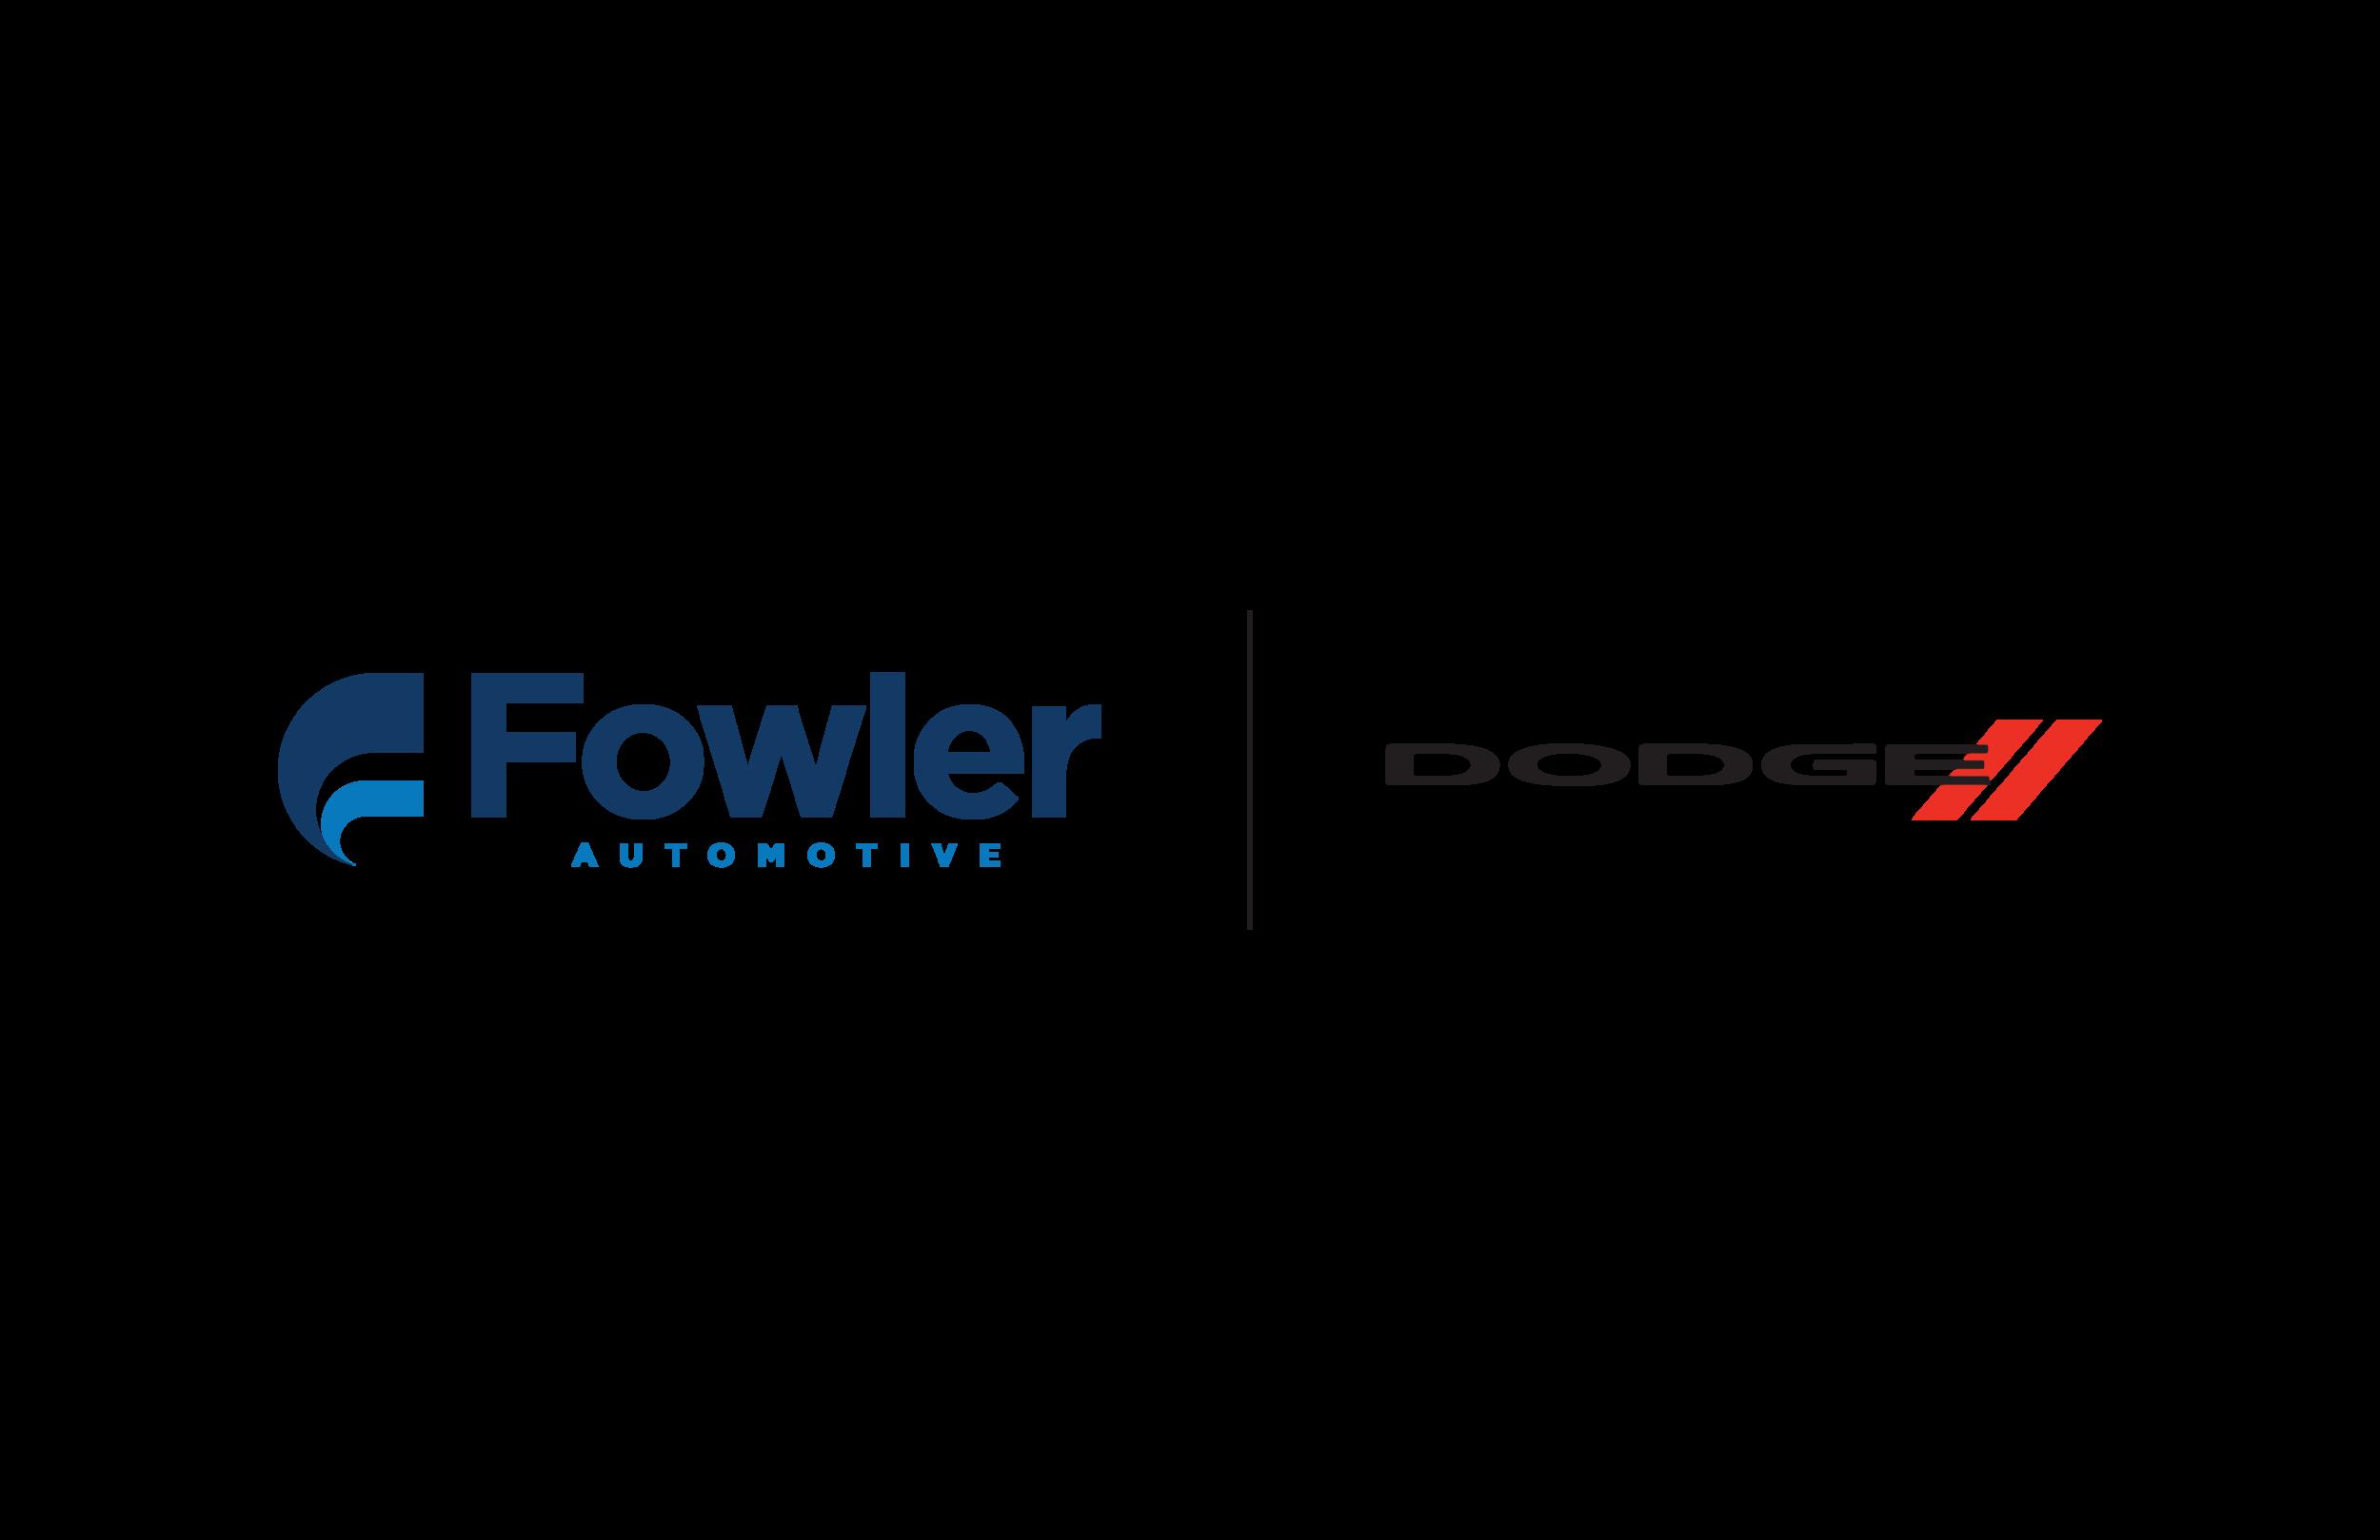 Fowler_Logo_Dodge.png